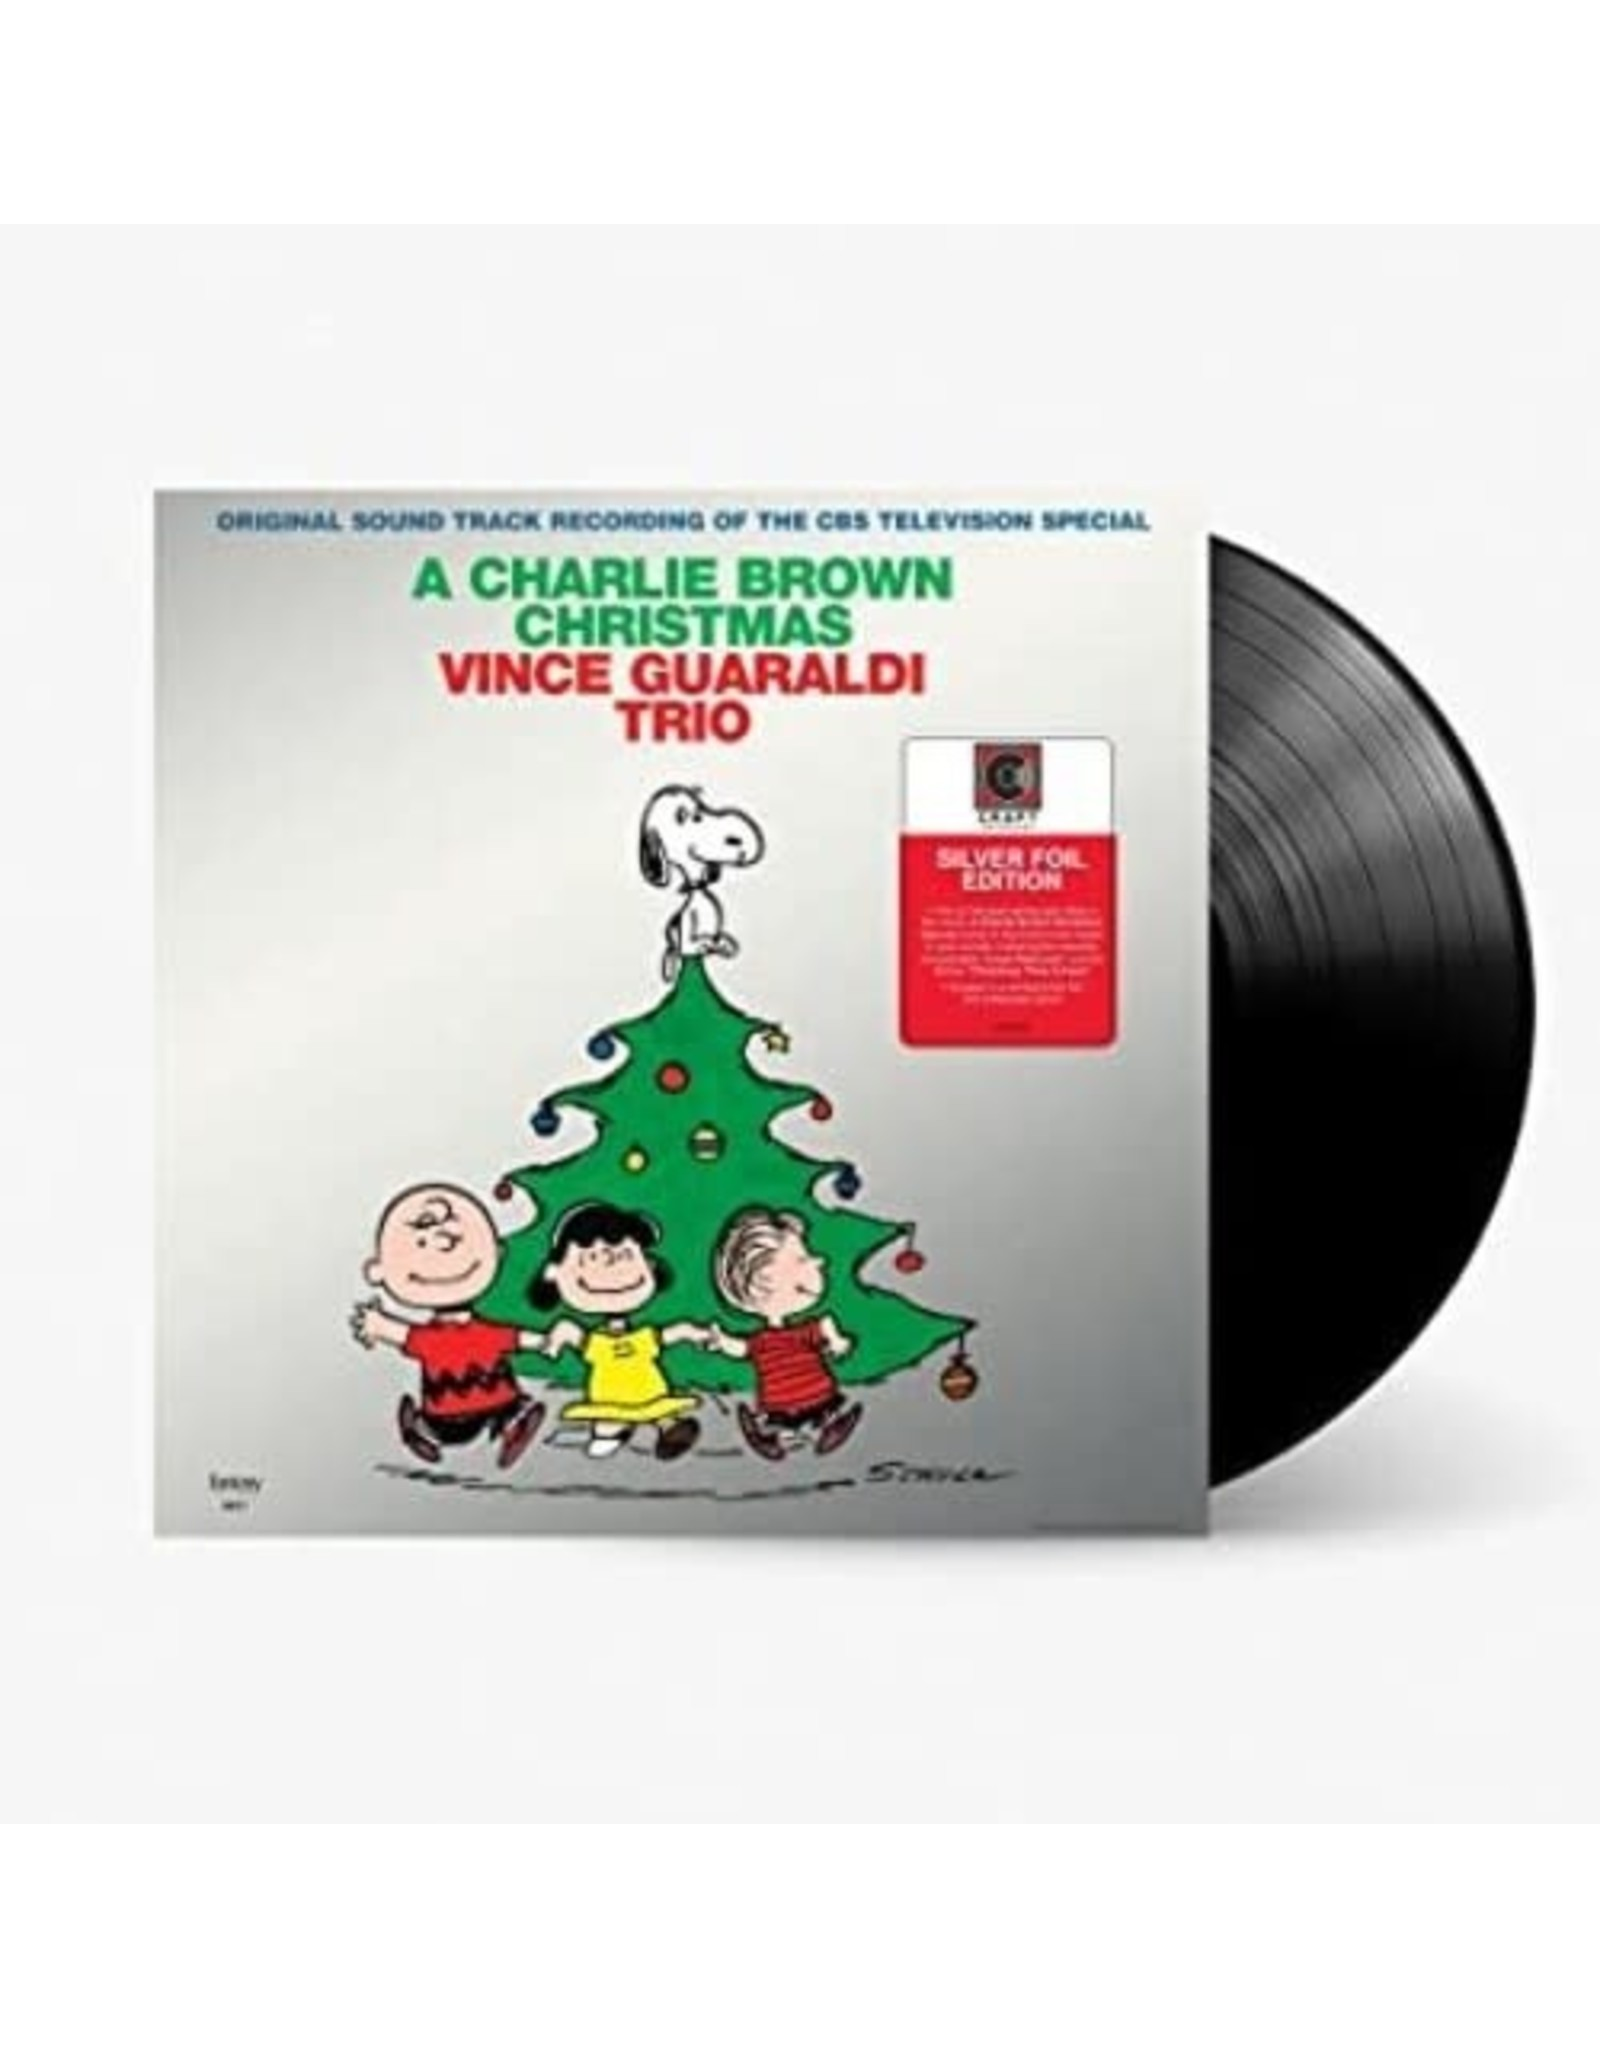 New Vinyl Vince Guaraldi Trio - A Charlie Brown Christmas: 2021 Edition (Silver Foil Cover) LP